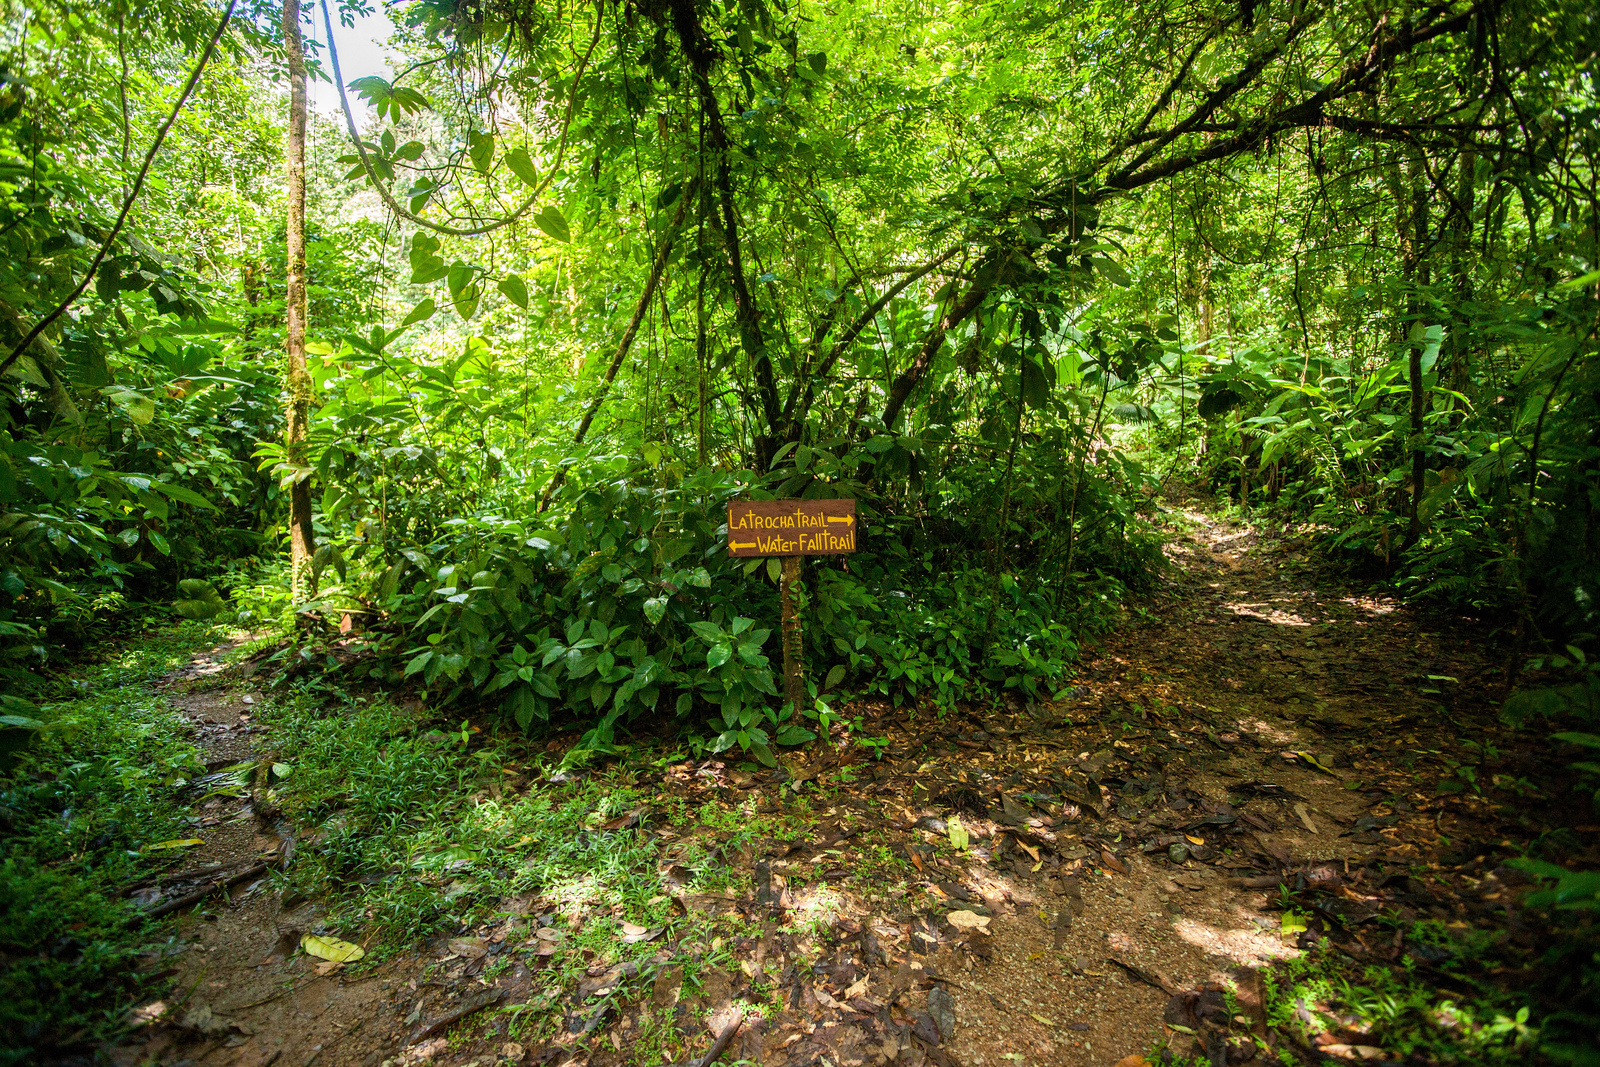 osa peninsula - rainforest of the austrians